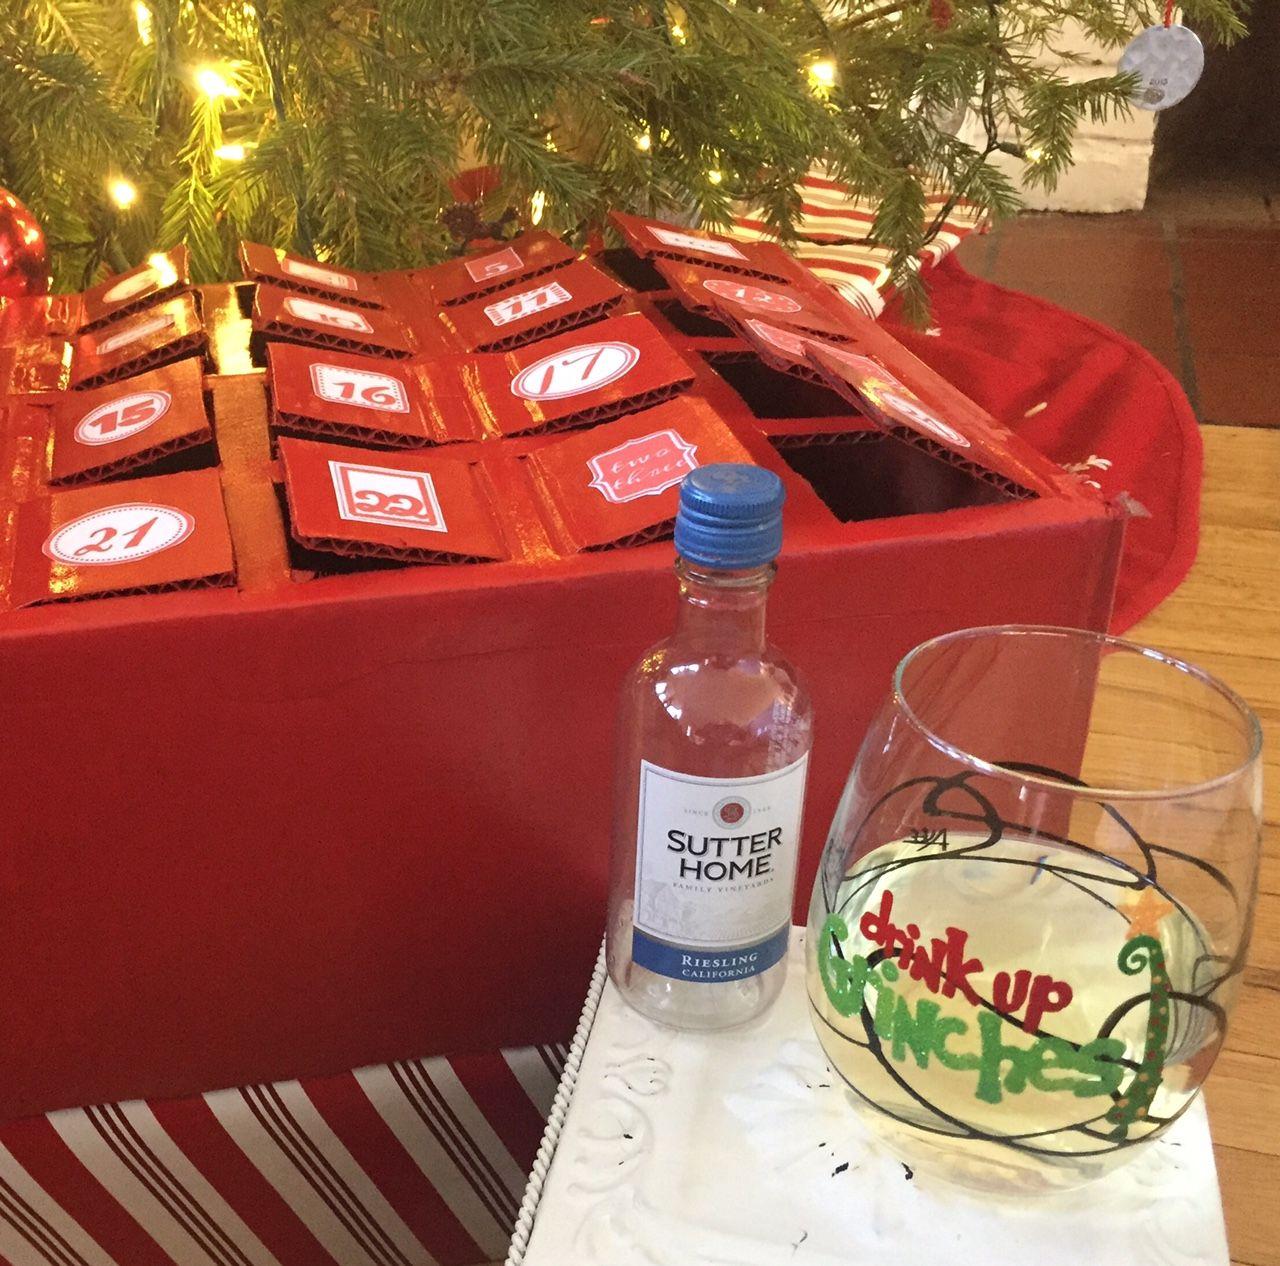 Diy Wine Advent Calendar Box With Festive Amanda Lee Glassware Glass Wine Advent Calendar Advent Calendar Boxes Diy Wine